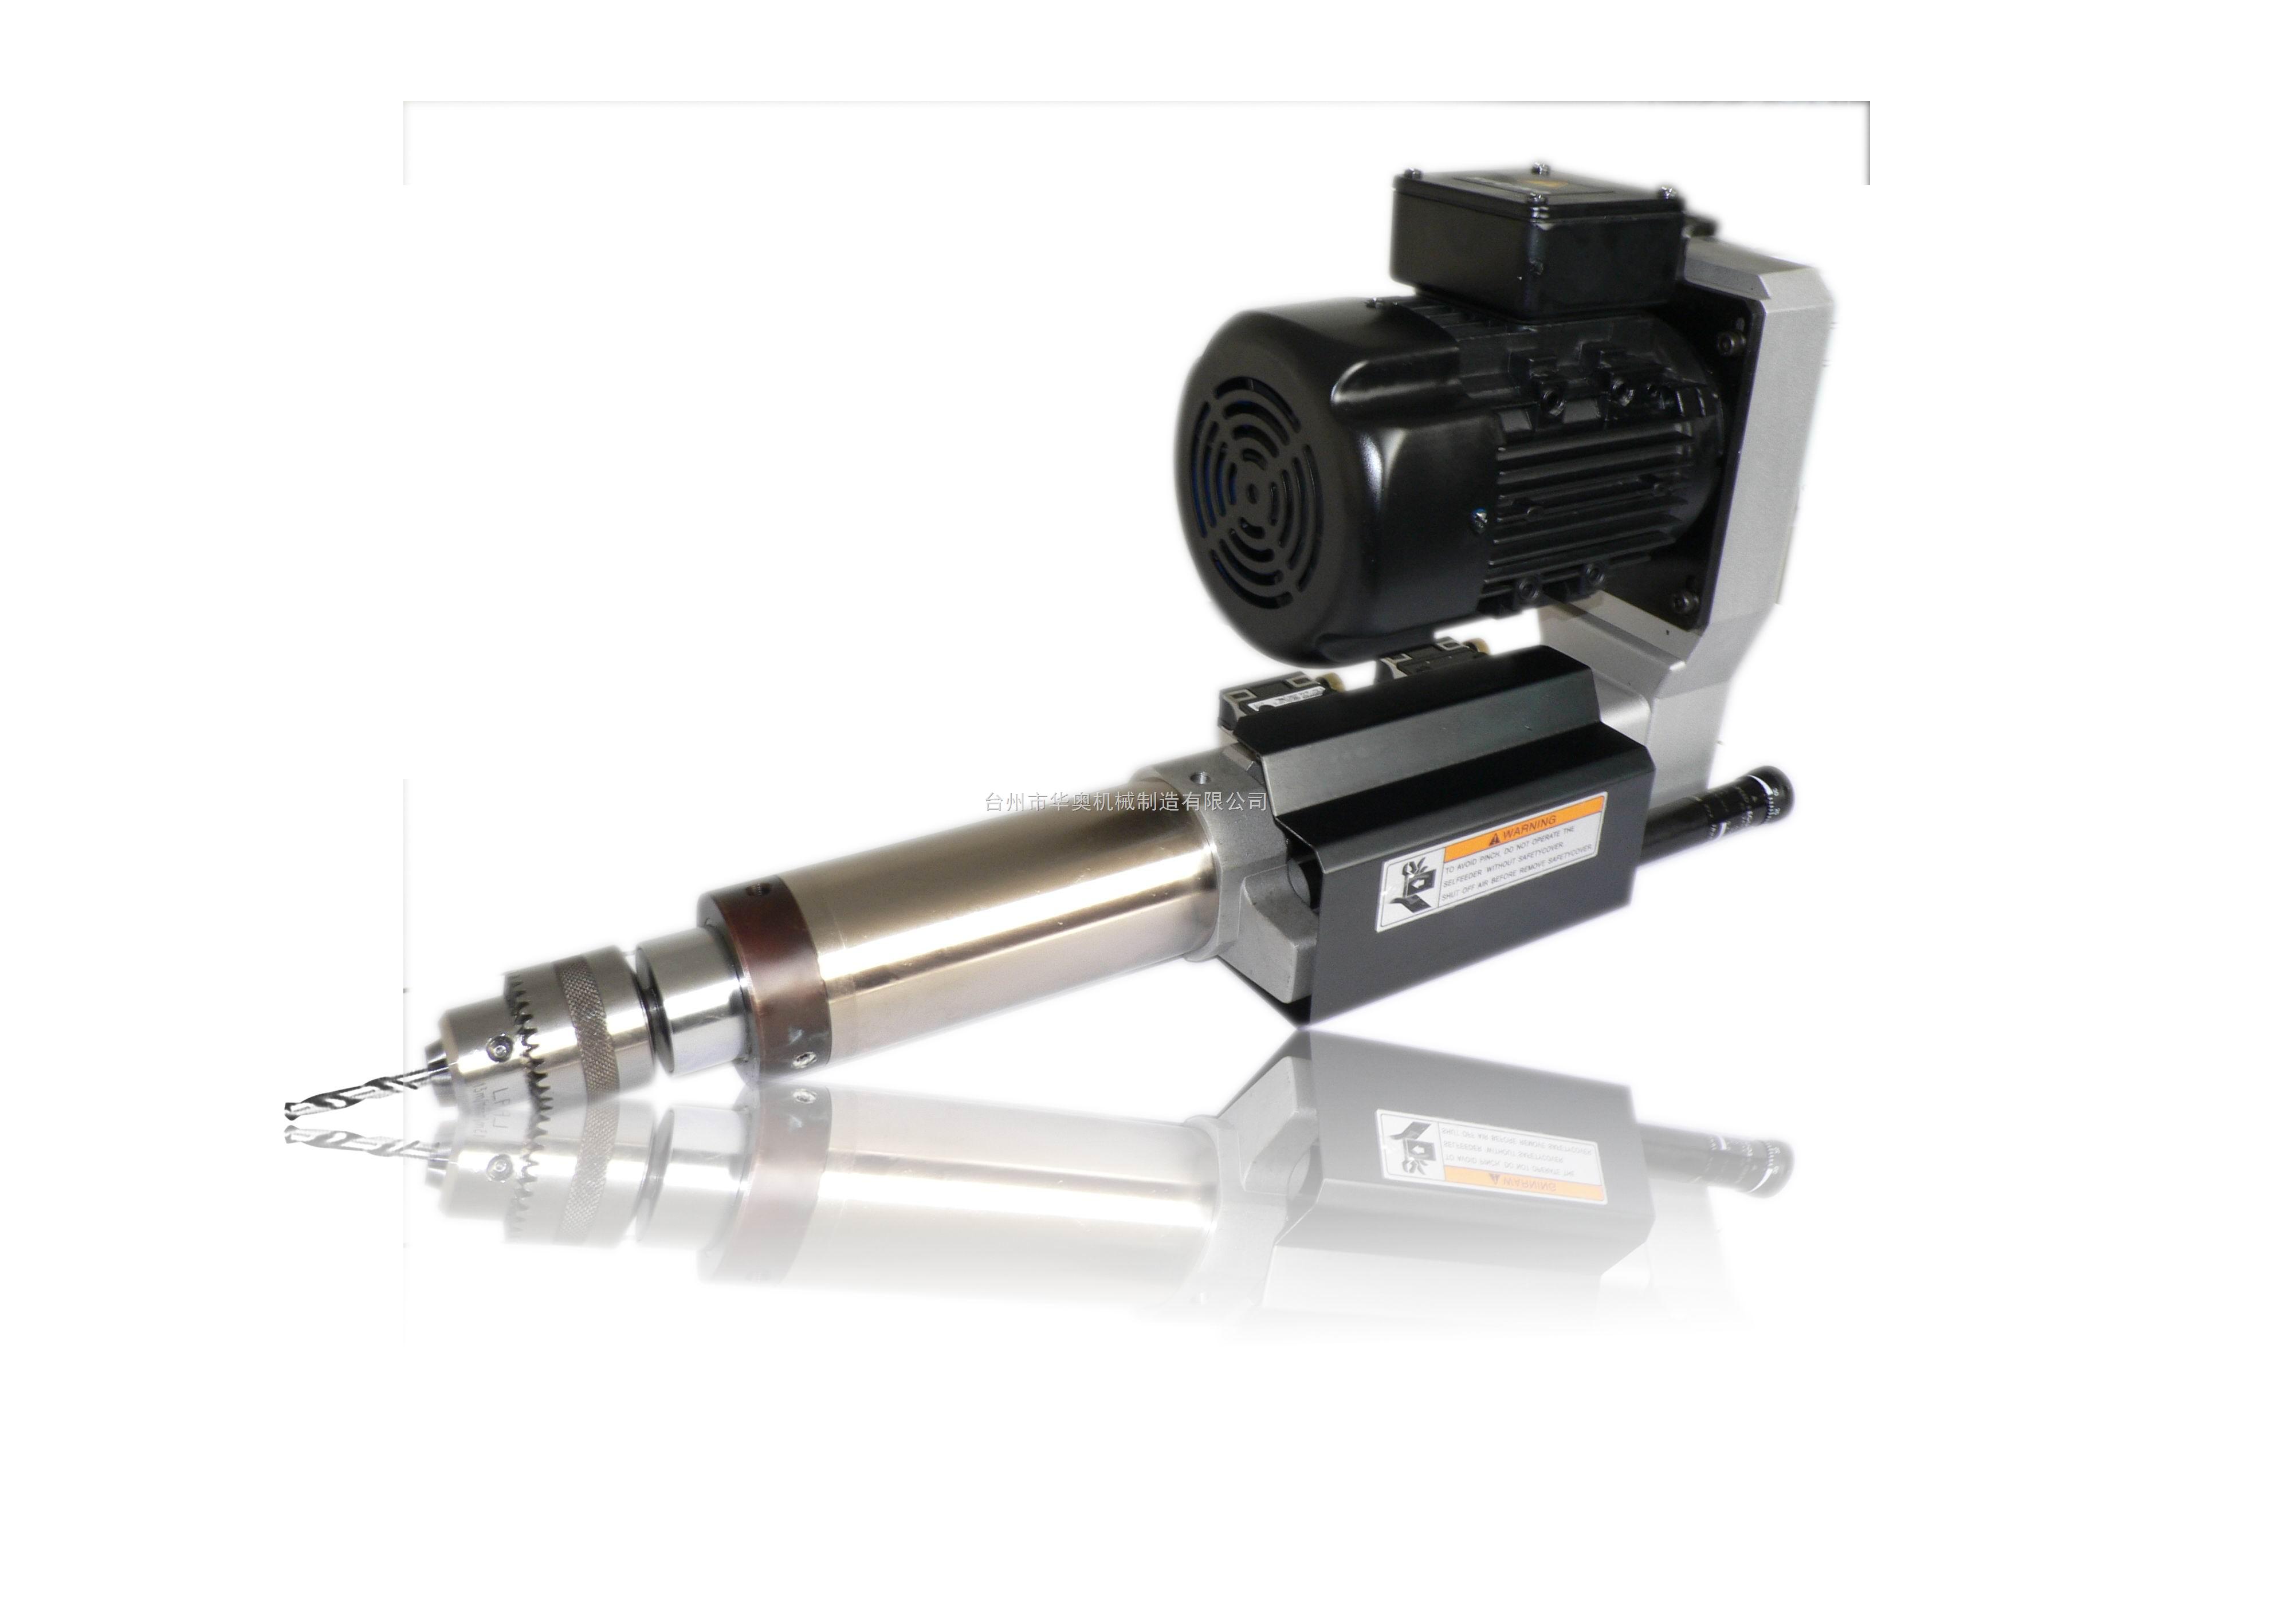 RVS5钻孔动力头带阻尼器